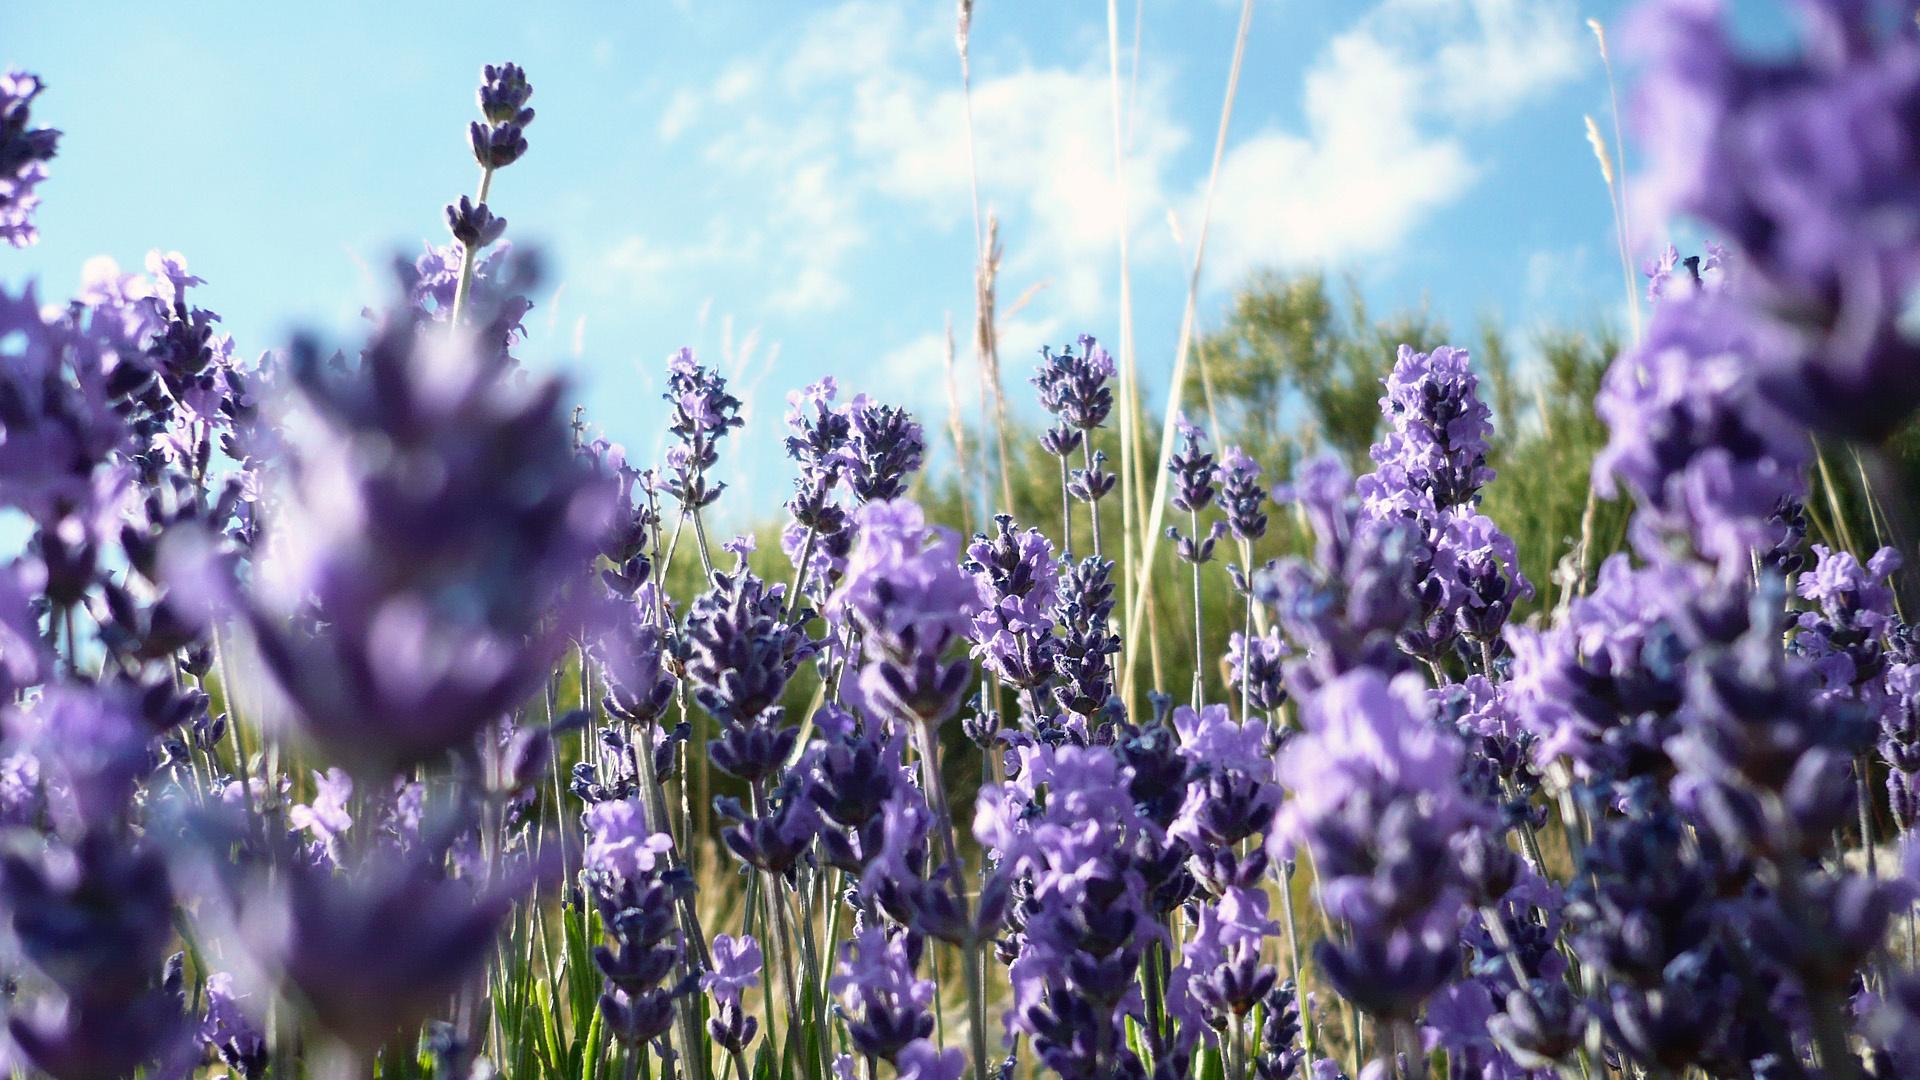 hinh anh lavender 4